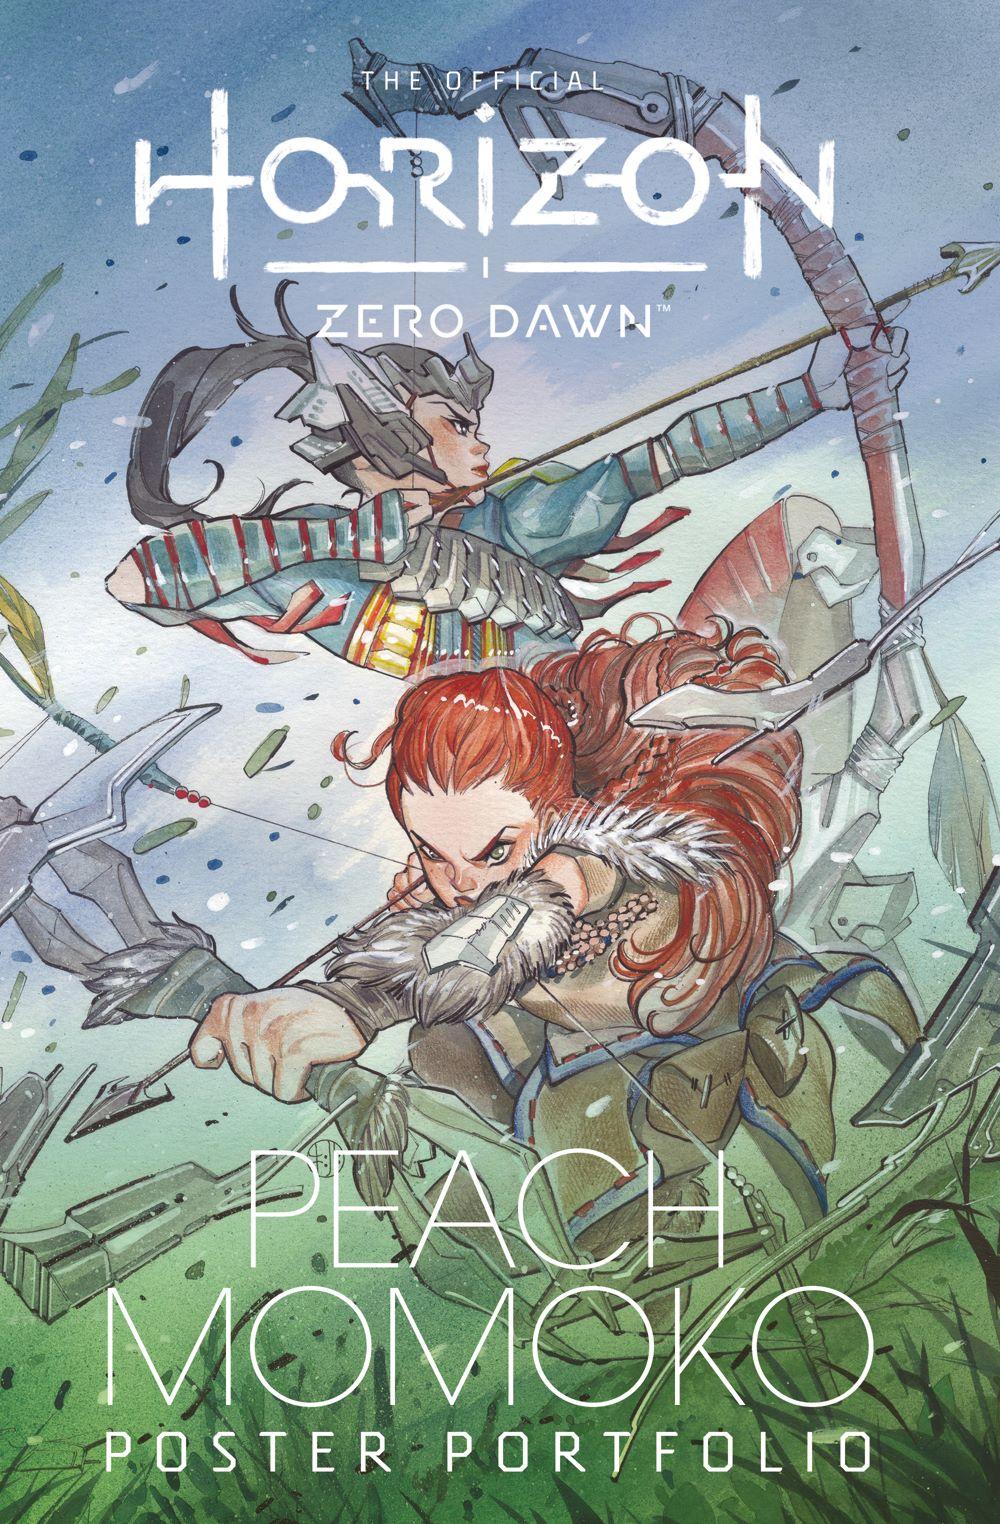 PEACH-MOMOKO-PORTFOLIO Titan Comics July 2021 Solicitations